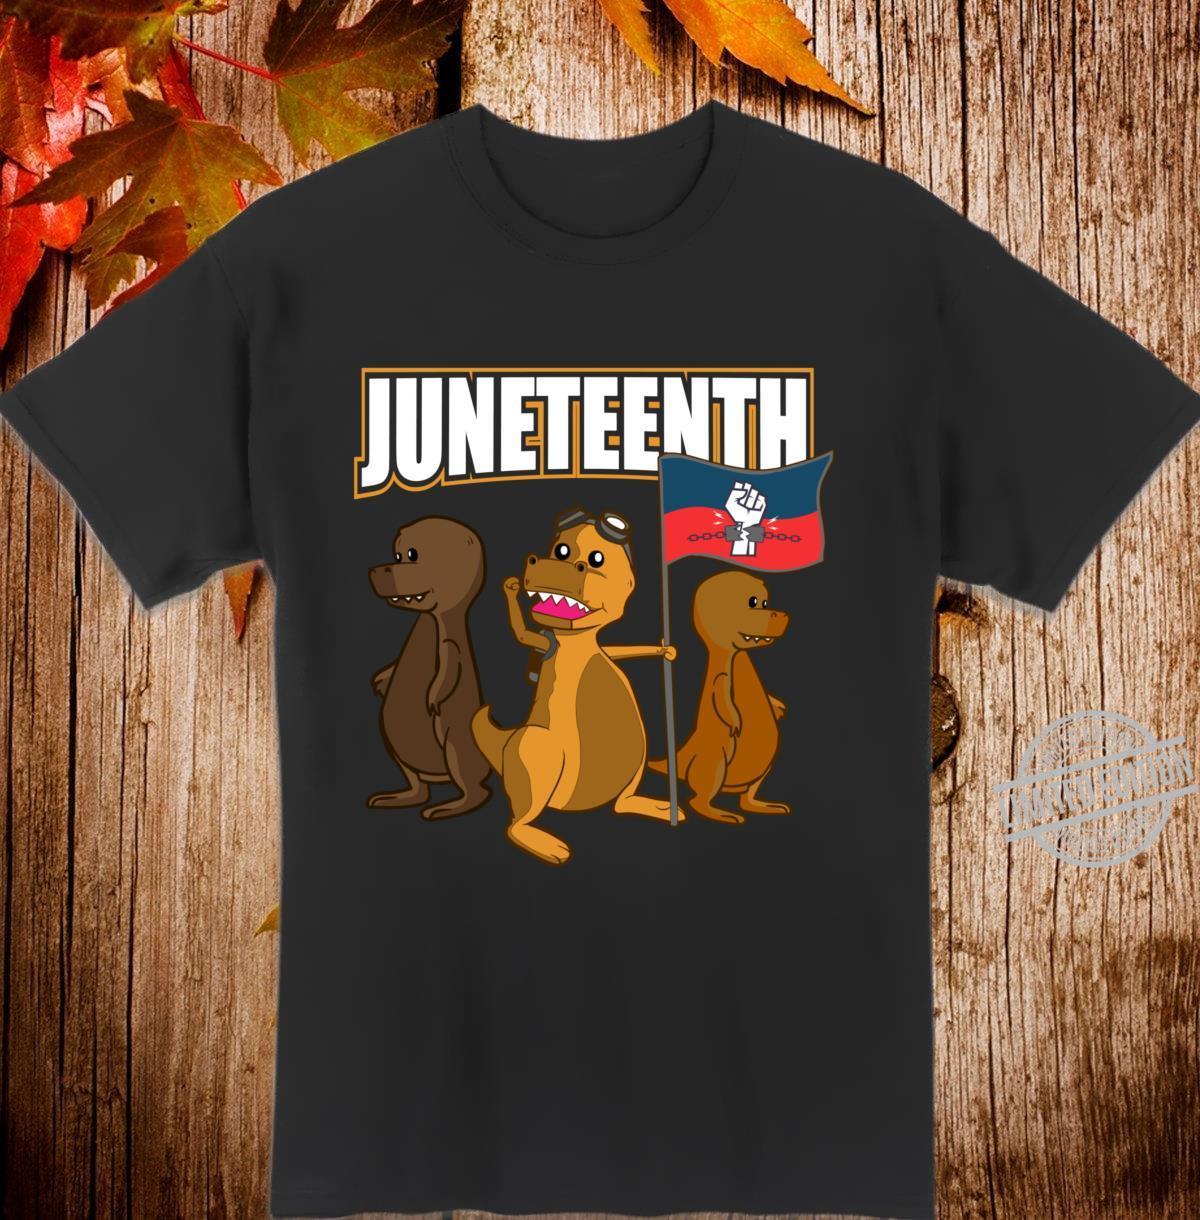 Black Power Cute African American Dinosaur TRex Shirt